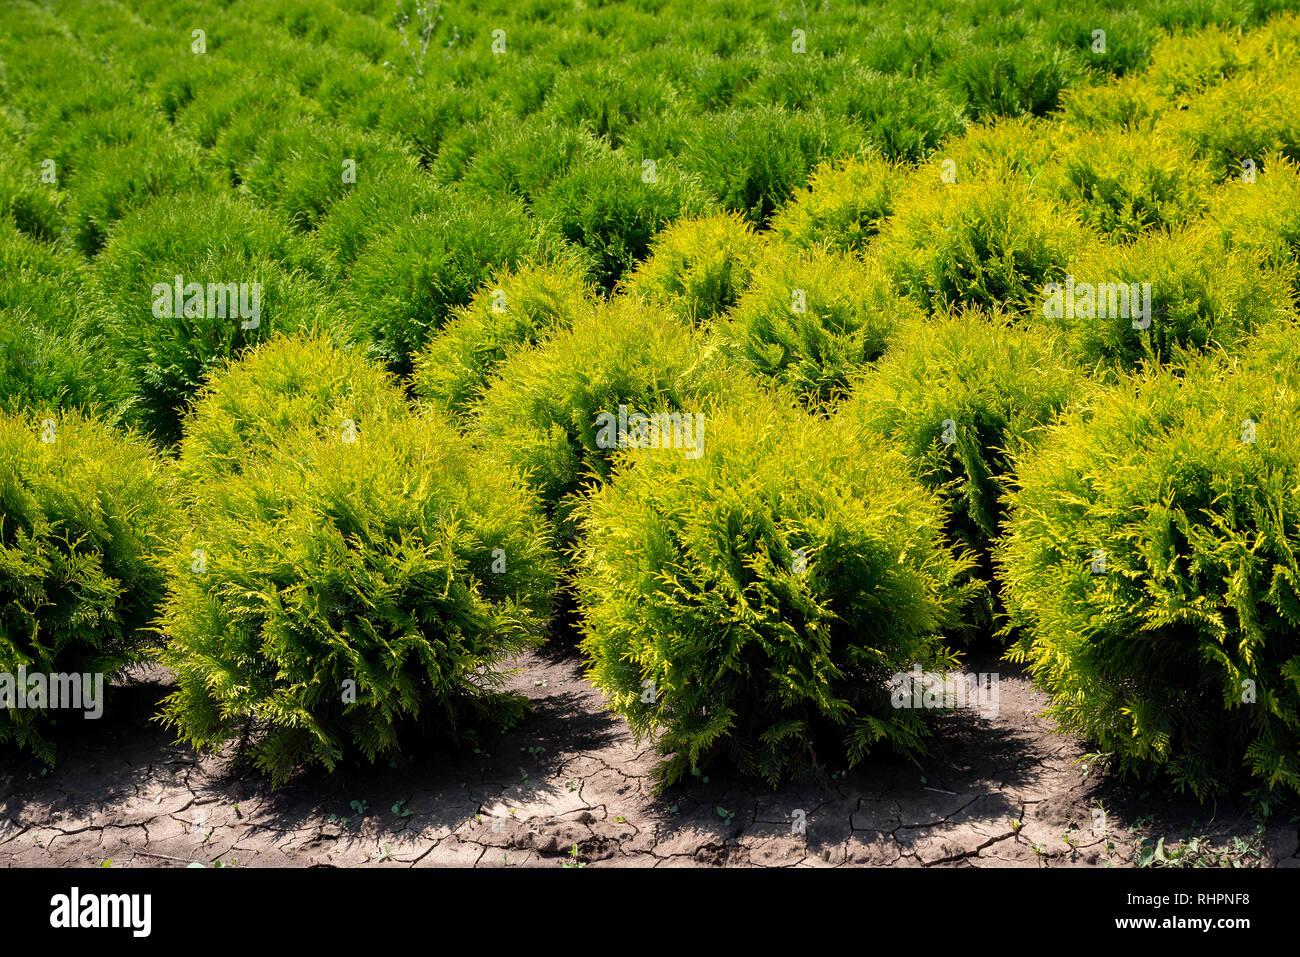 Plant nursery. Thuja occidentalis in garden center. - Stock Image